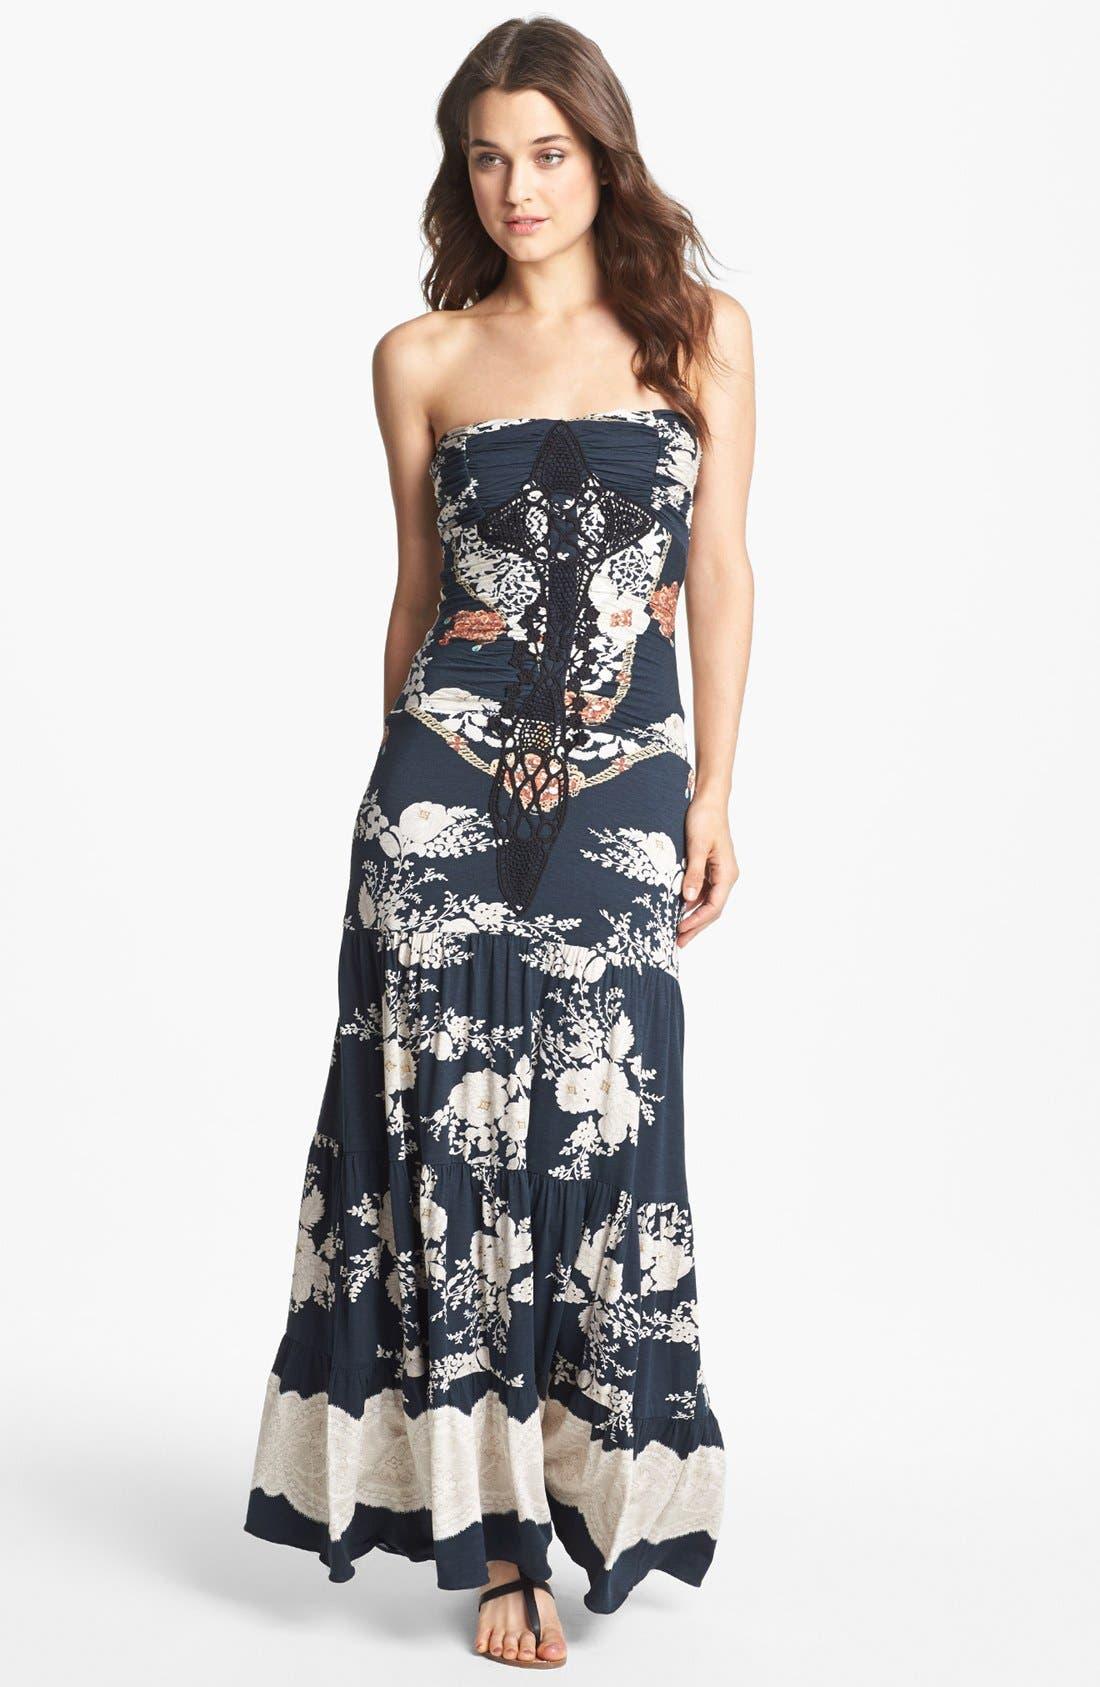 Alternate Image 1 Selected - Sky Print Embellished Maxi Dress